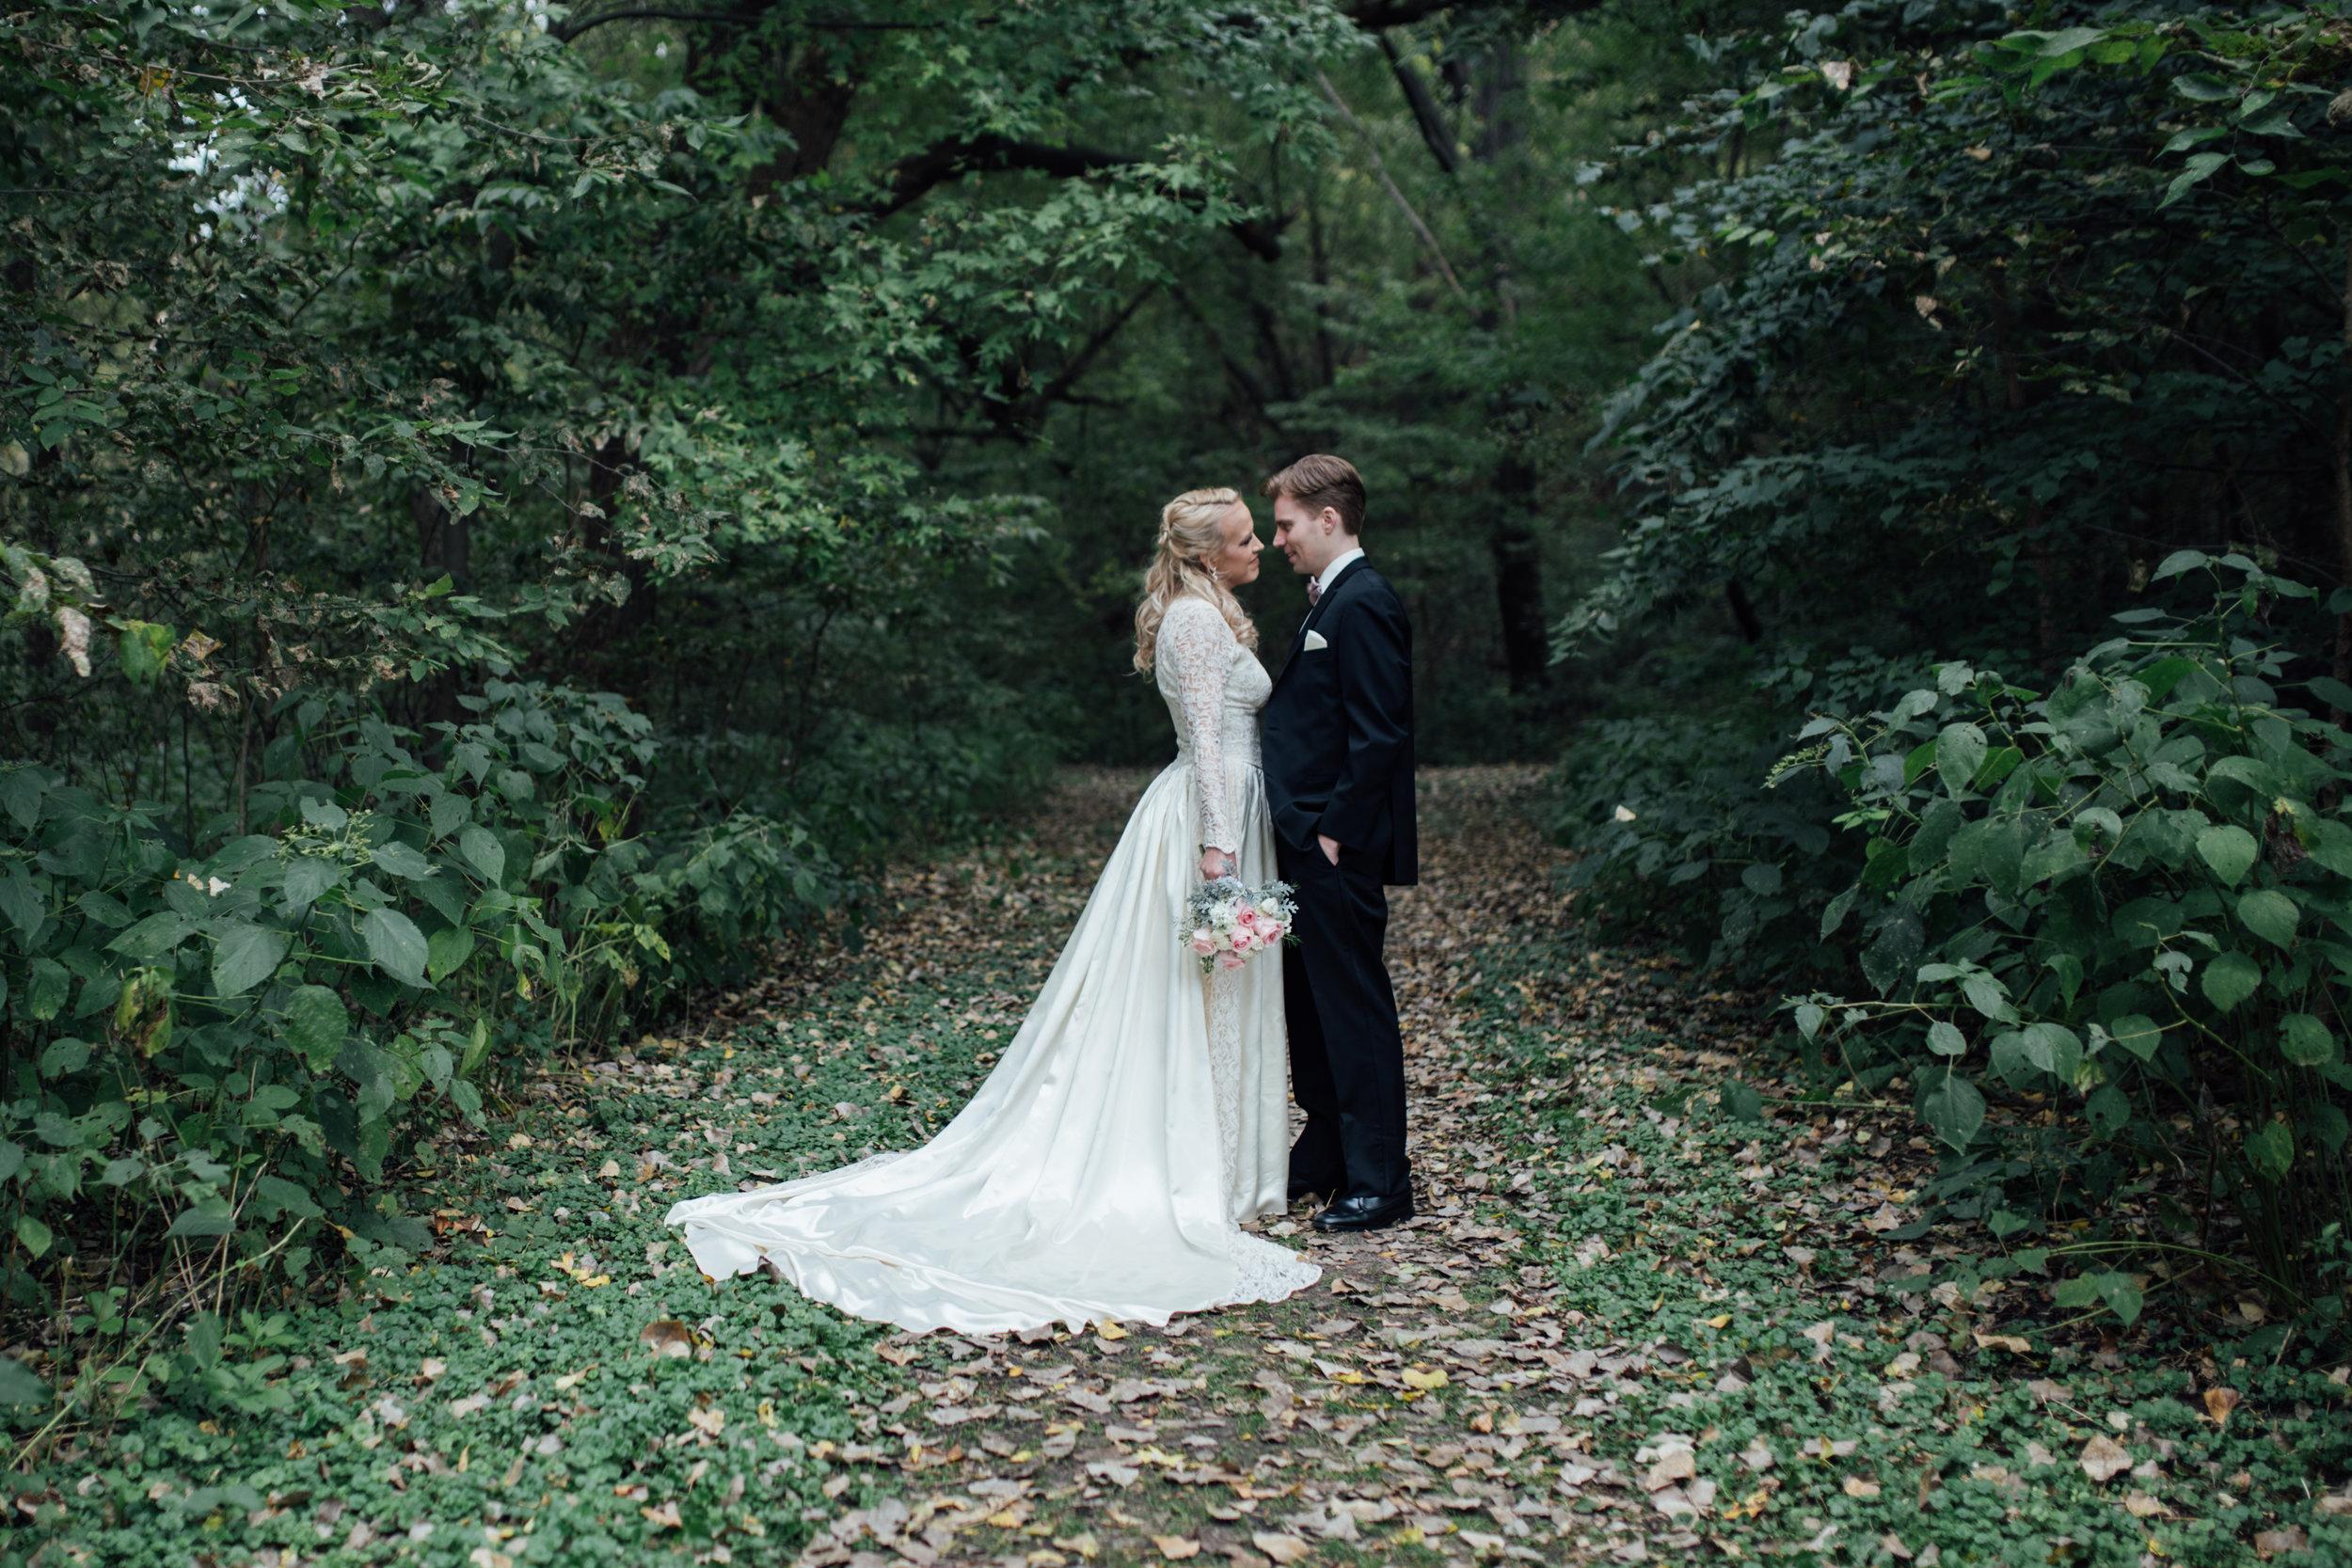 laurel-lee-photography-wedding-photographer-minnesota-1.jpg